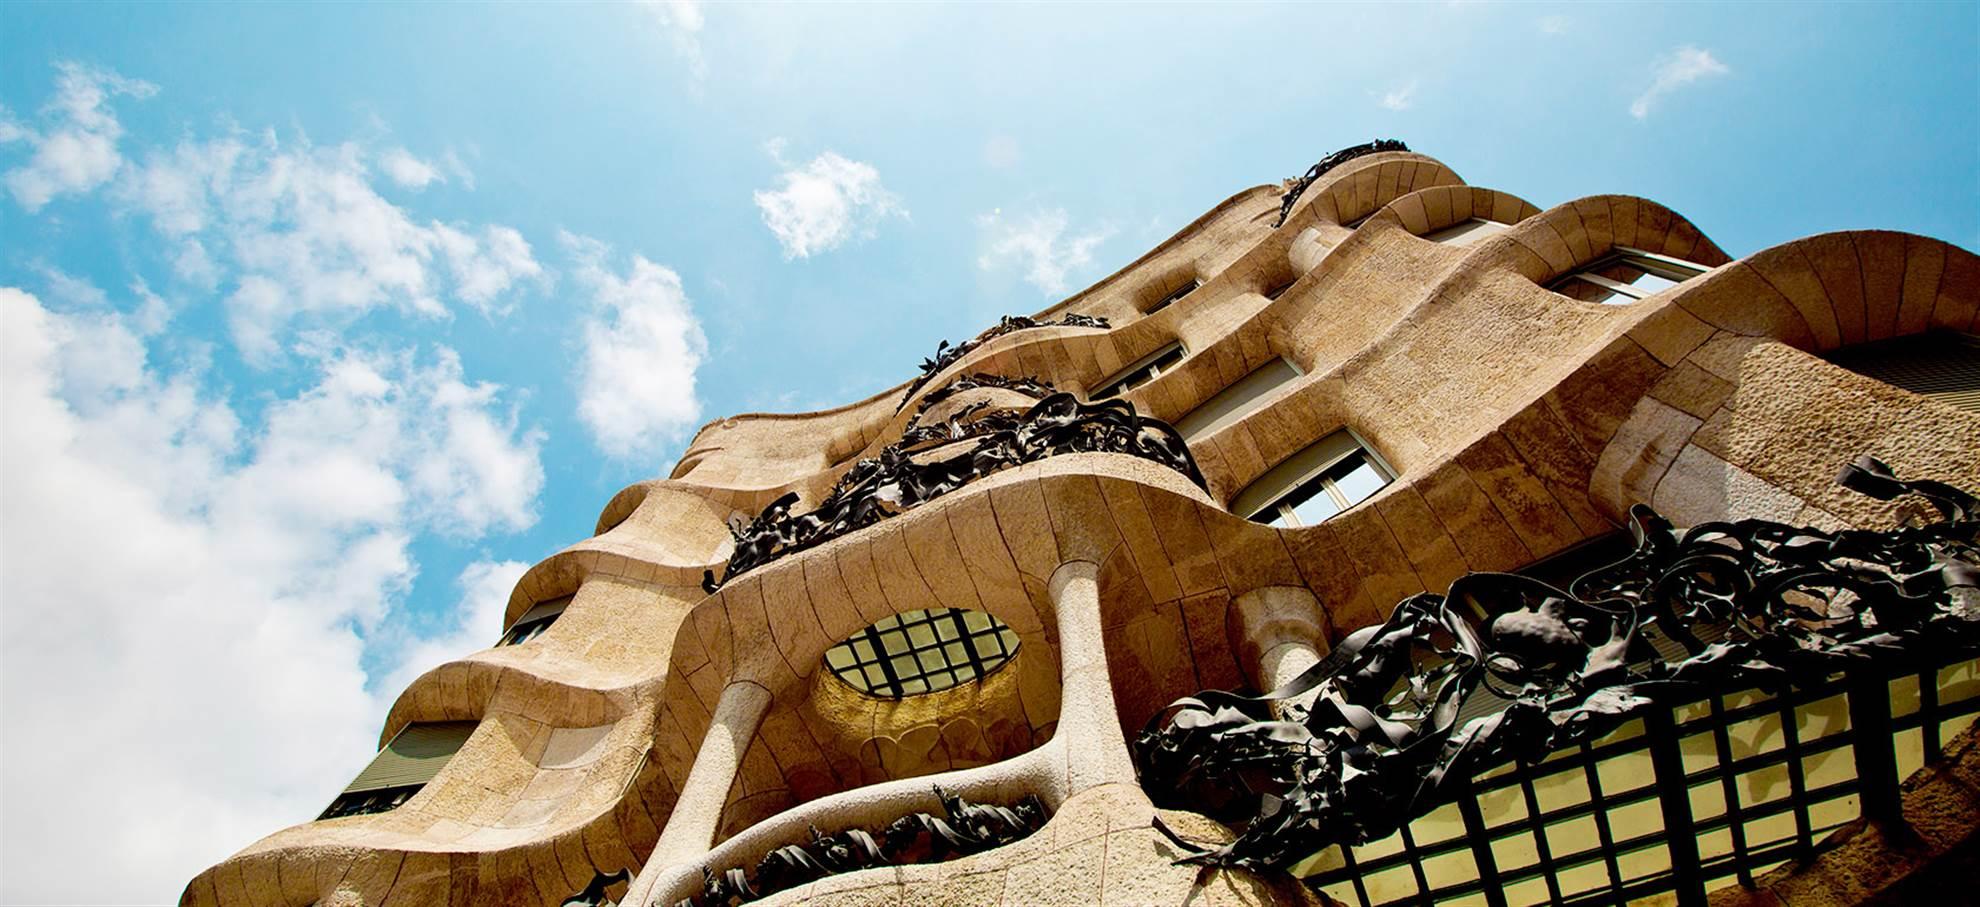 Entrada preferente Casa Milà (tickets sin fecha)